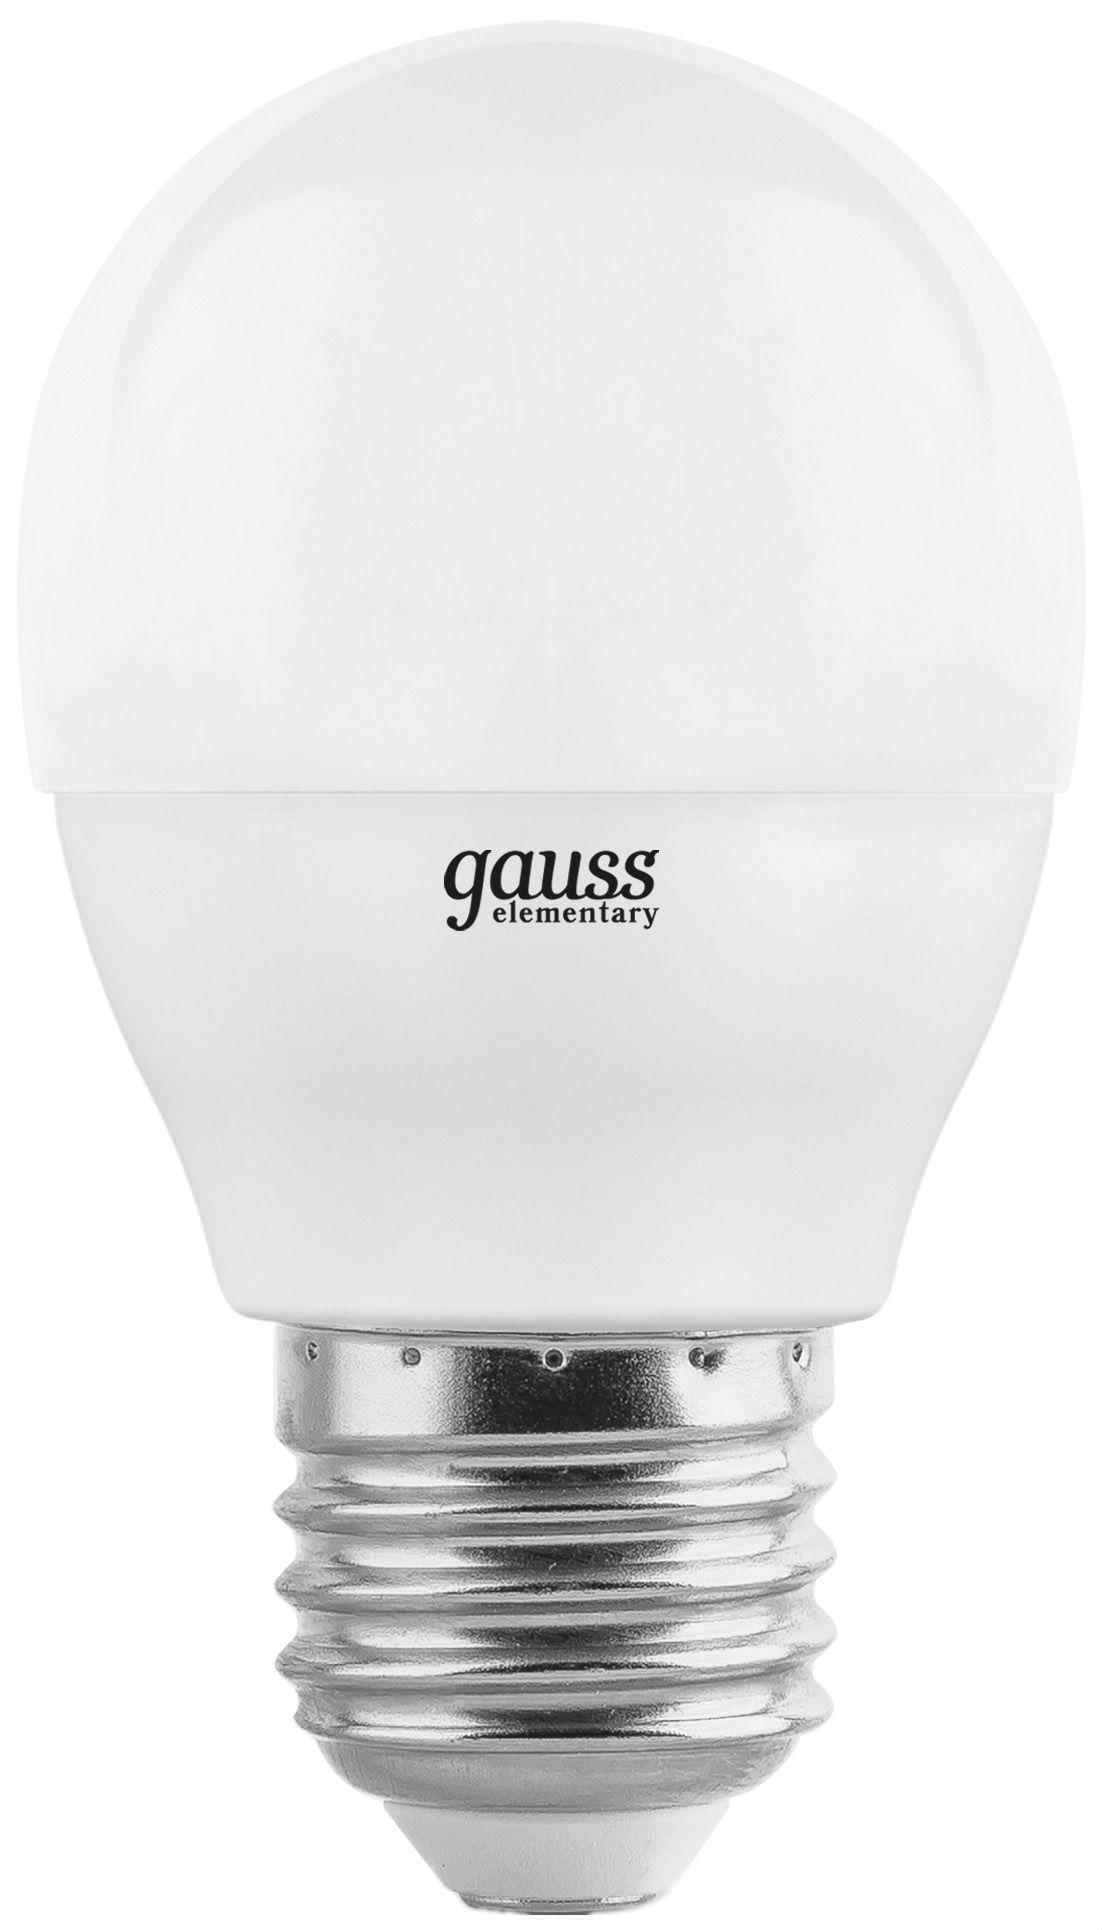 Лампа светодиодная Gauss Elementary 53216 6W E27 2700K фото